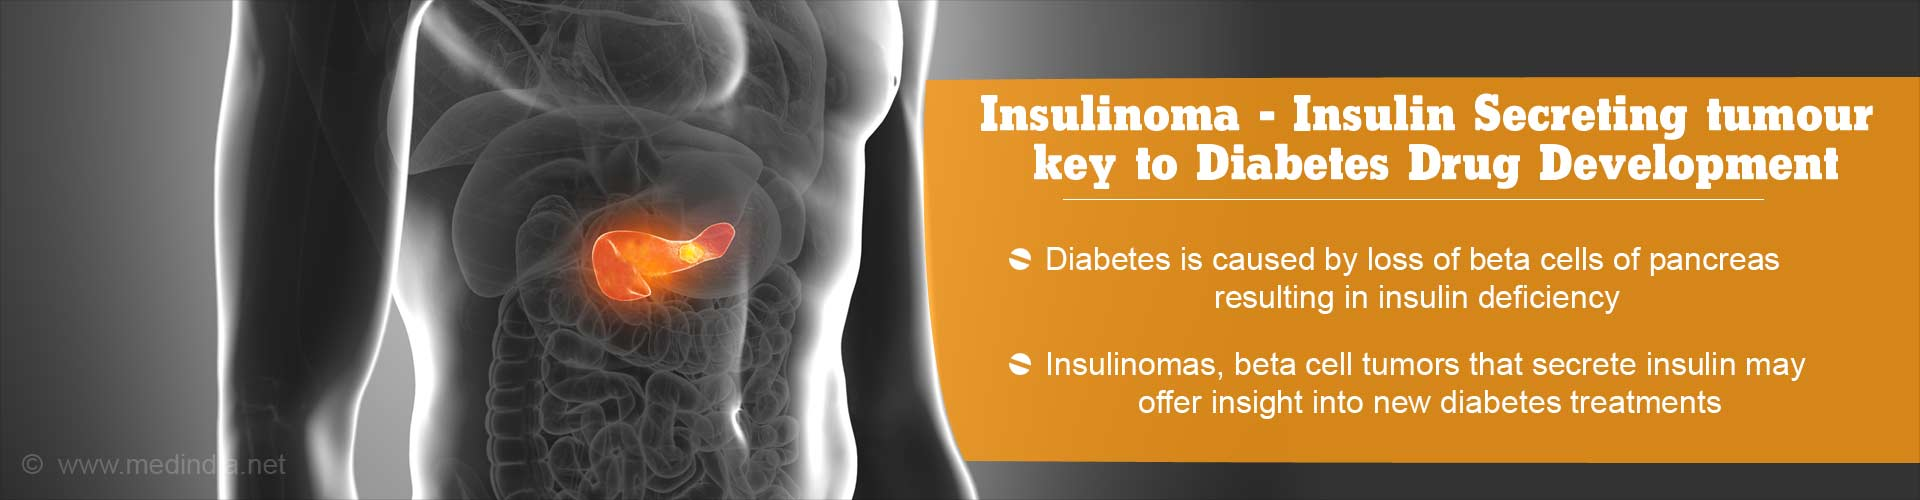 Insulinomas - Benign Tumors Secreting Insulin May Offer Insights To Combat Diabetes